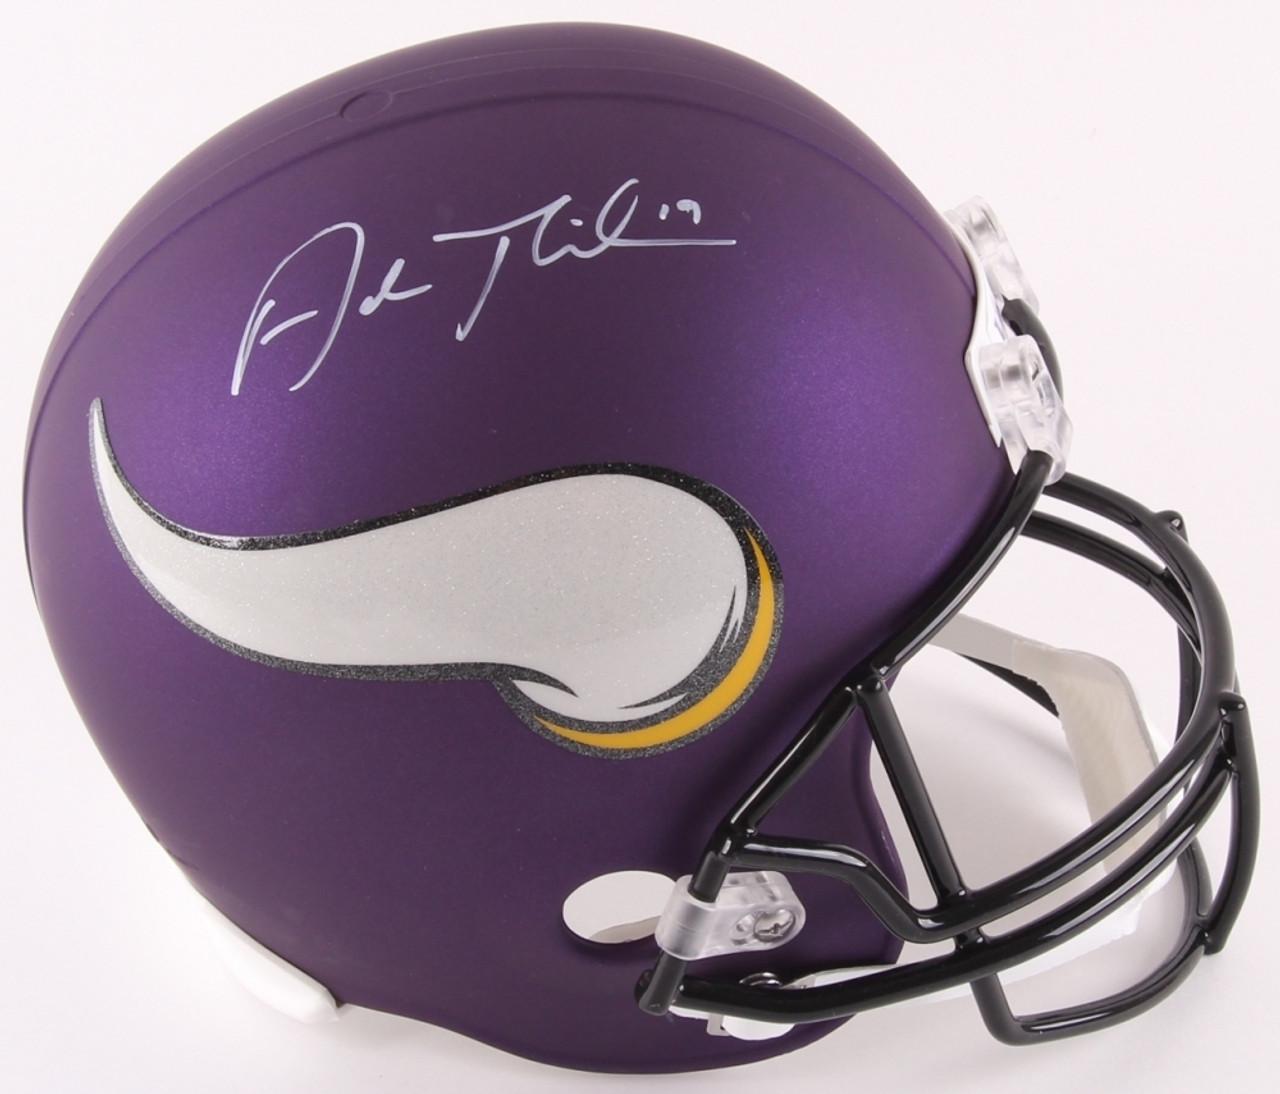 78023fd13 Adam Thielen Minnesota Vikings Autographed Mini Football Helmet - Maverick  Autographs and Collectibles